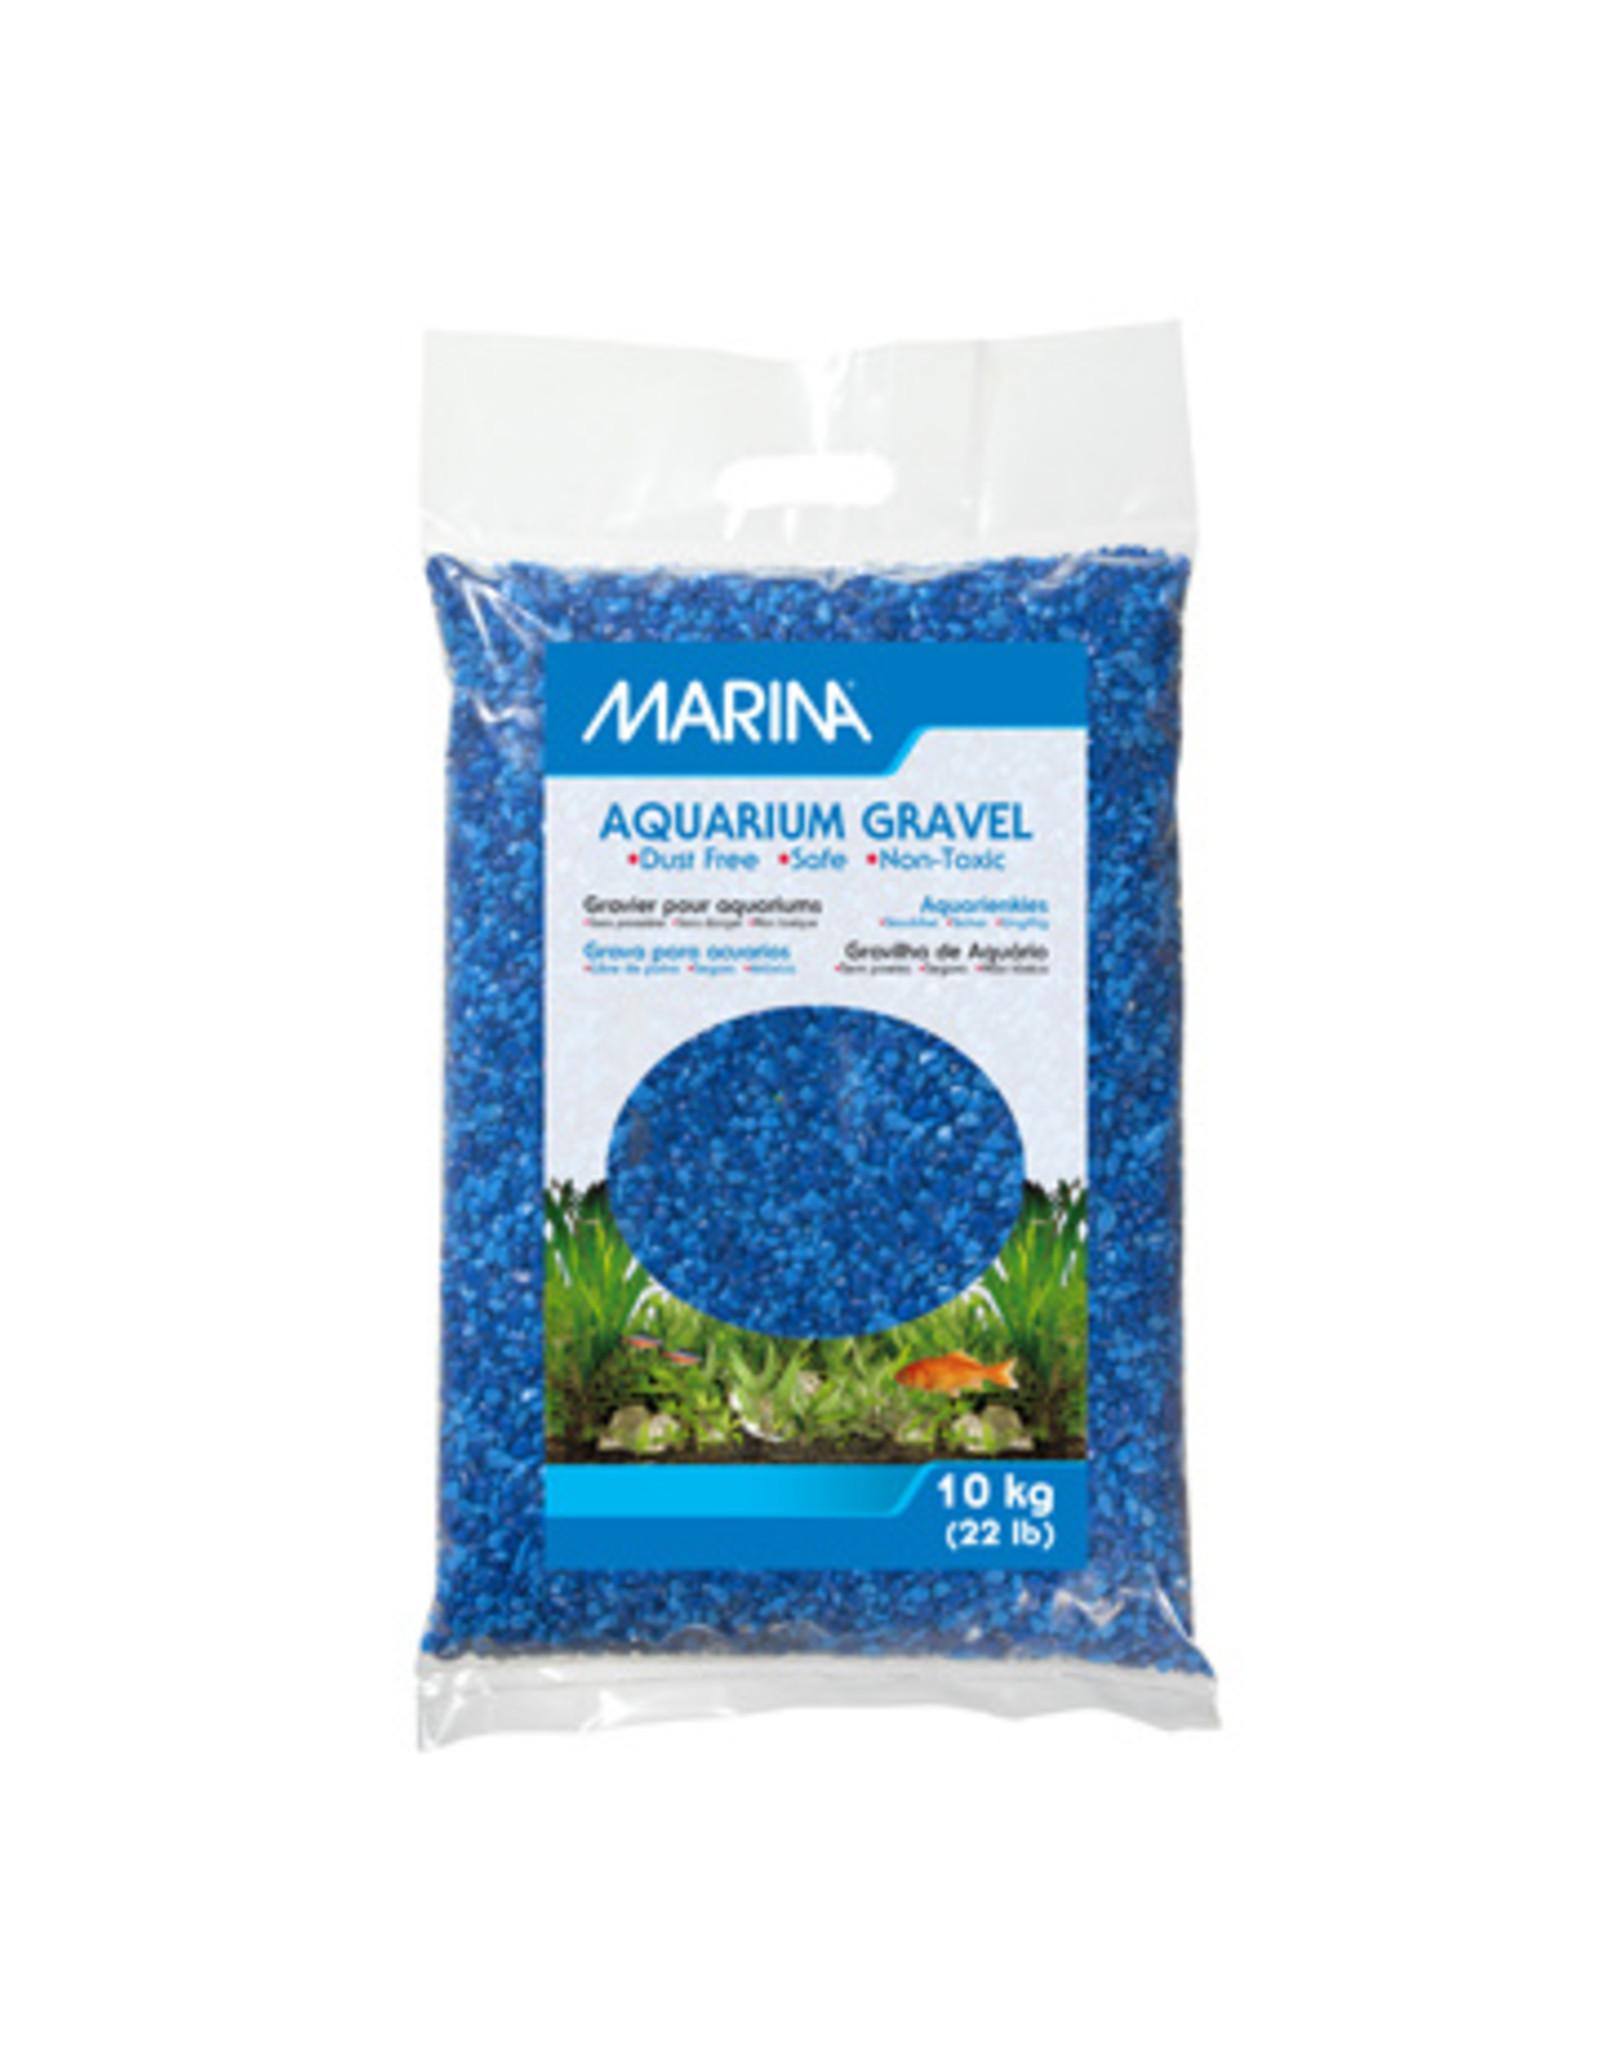 Marina MARINA Aquarium Gravel Blue